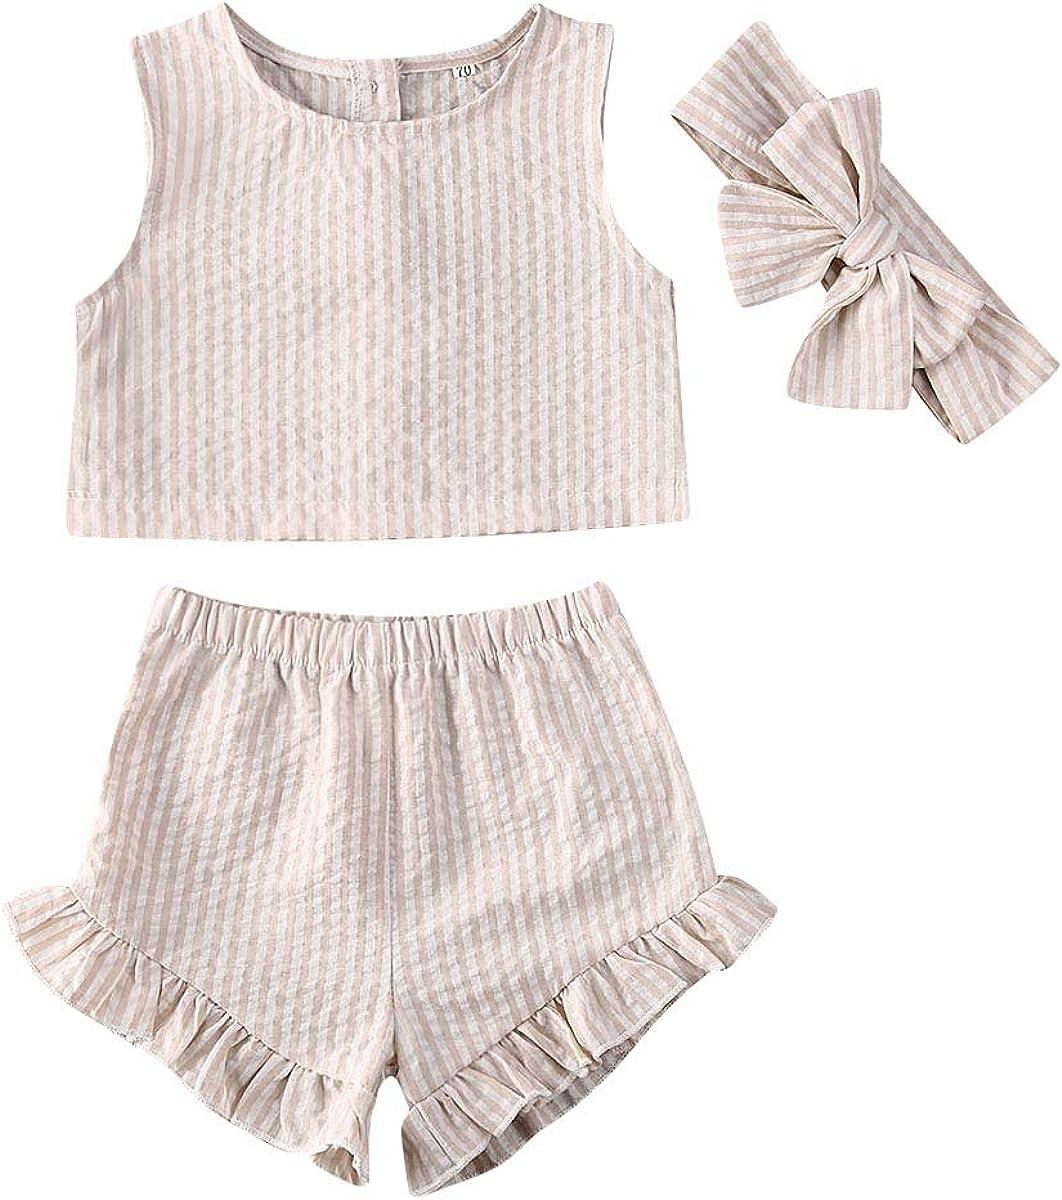 3Pcs/Set Toddler Baby Girl Striped Outfit Tank Crop Top + Ruffled Shorts + Headband Summer Clothes